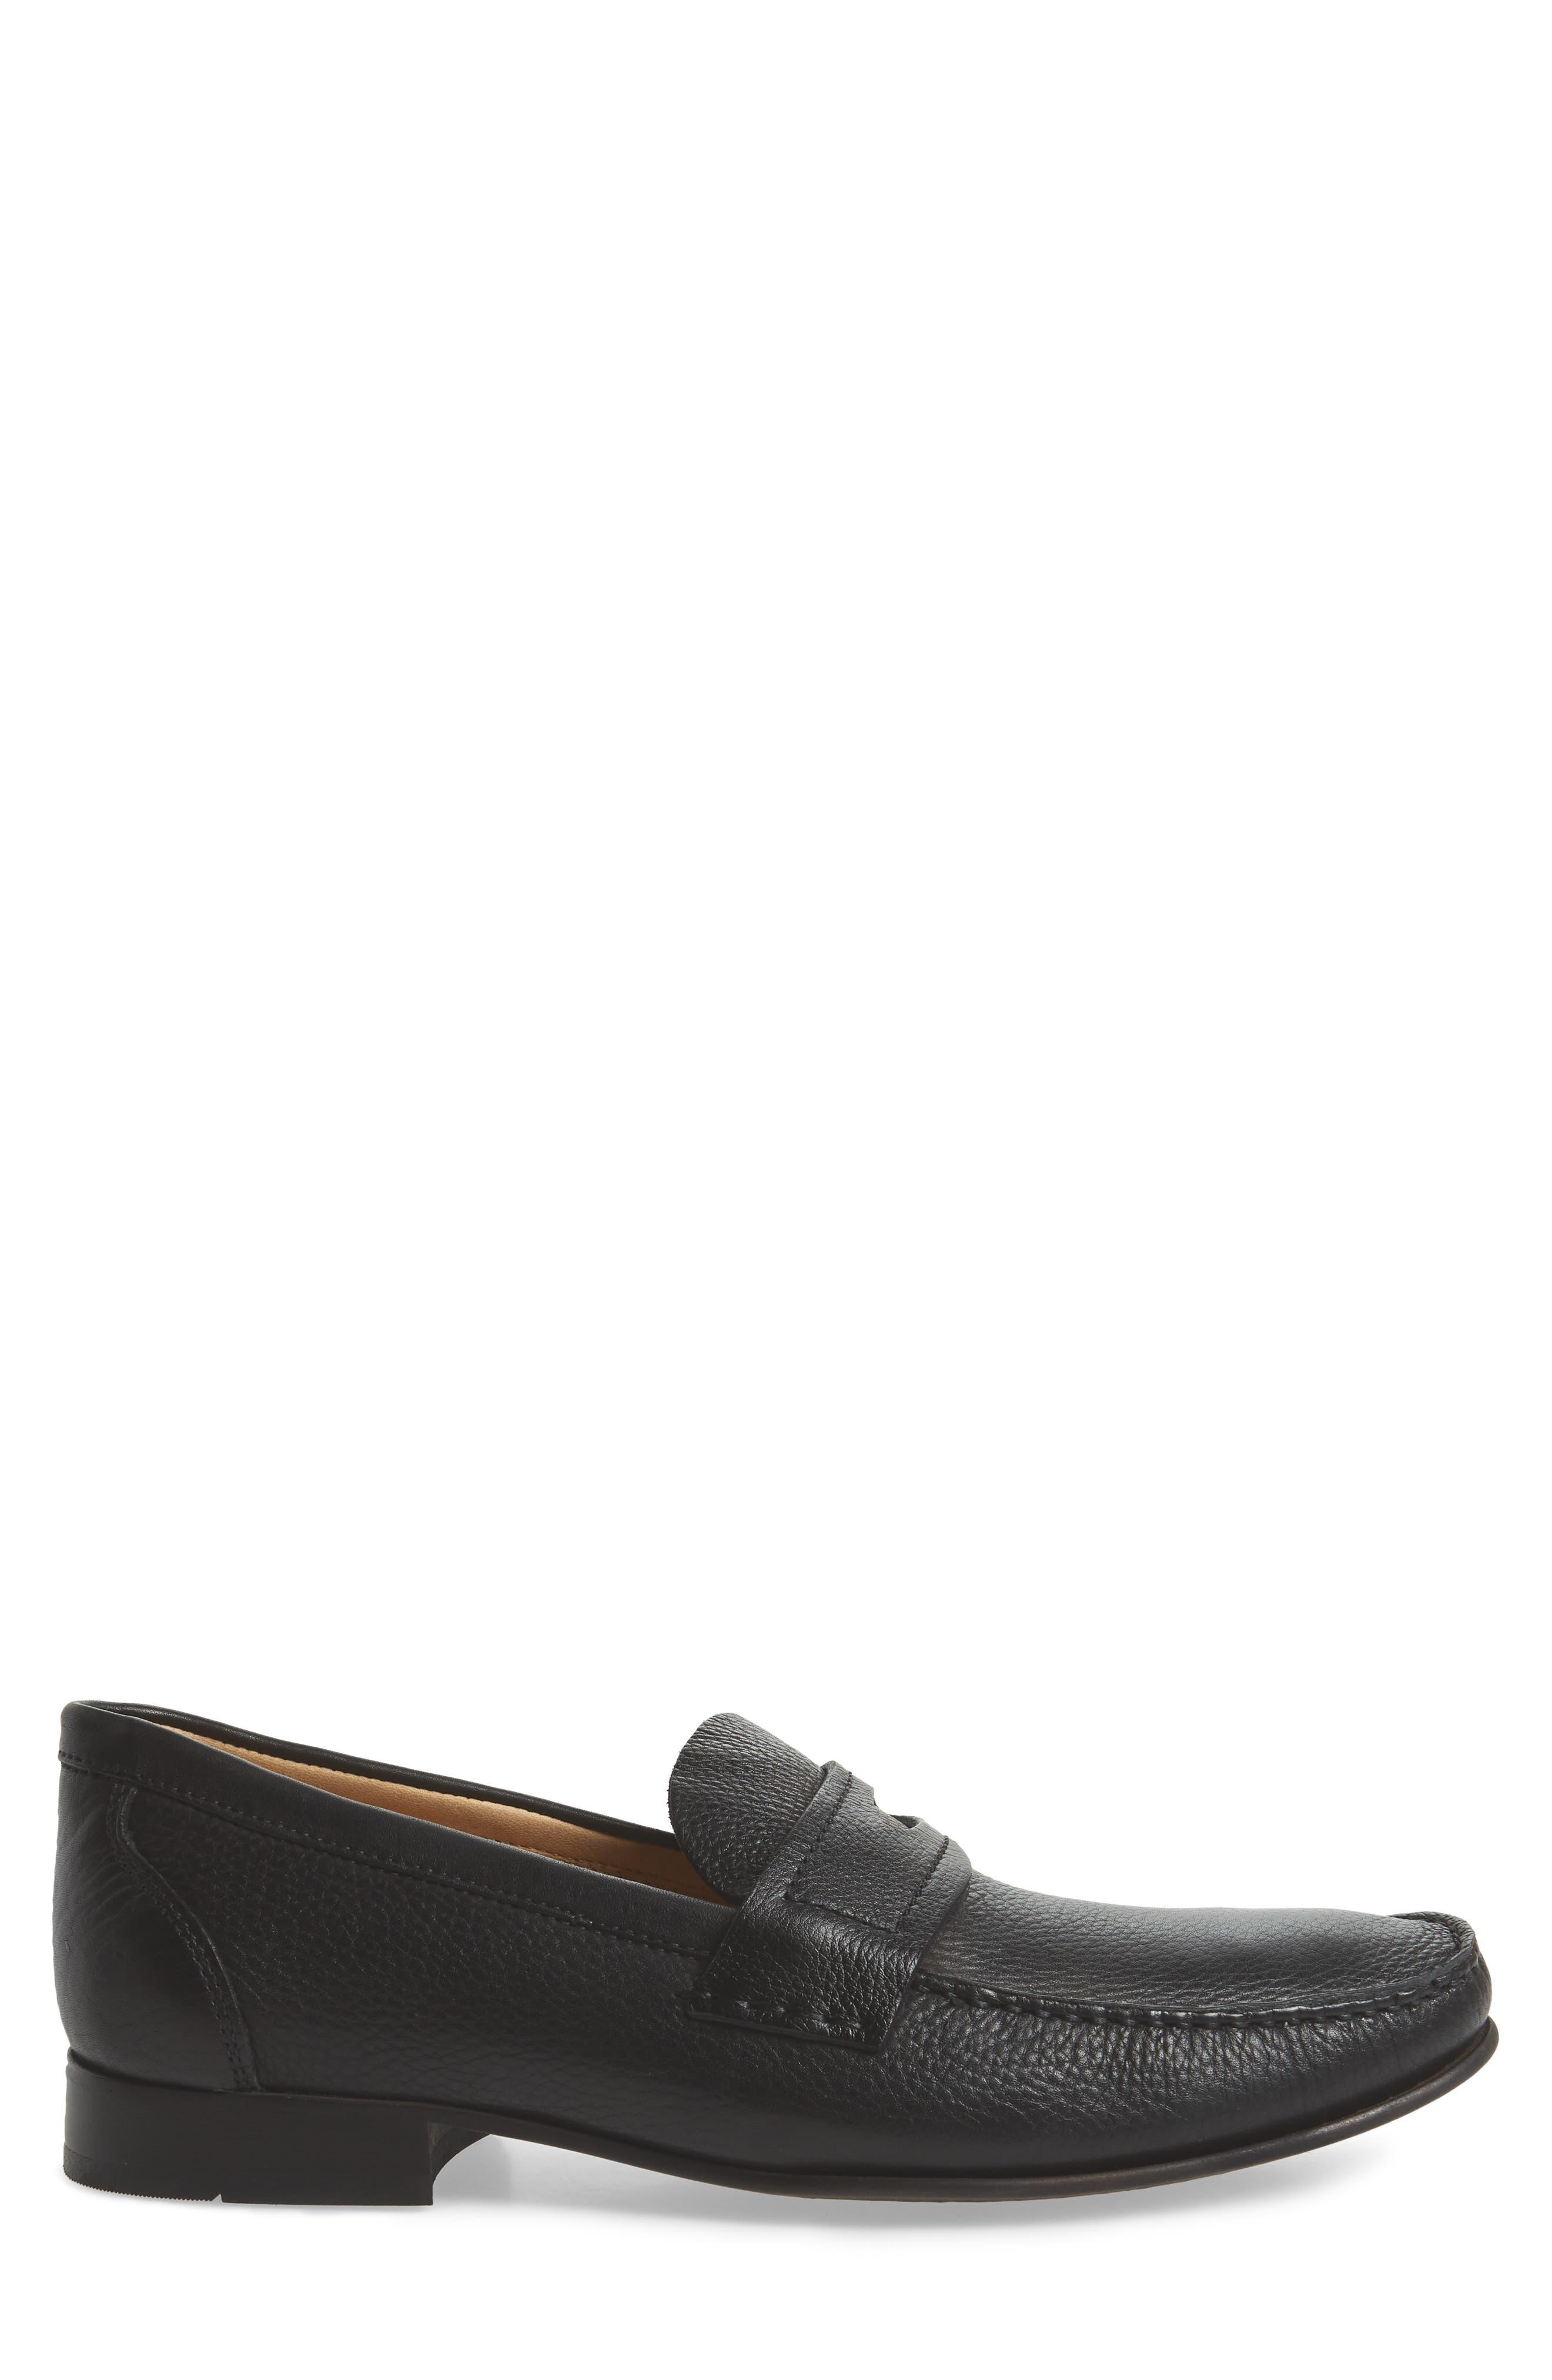 Eric Moc Toe Slip-On Loafer,                             Alternate thumbnail 3, color,                             Floater Black Leather